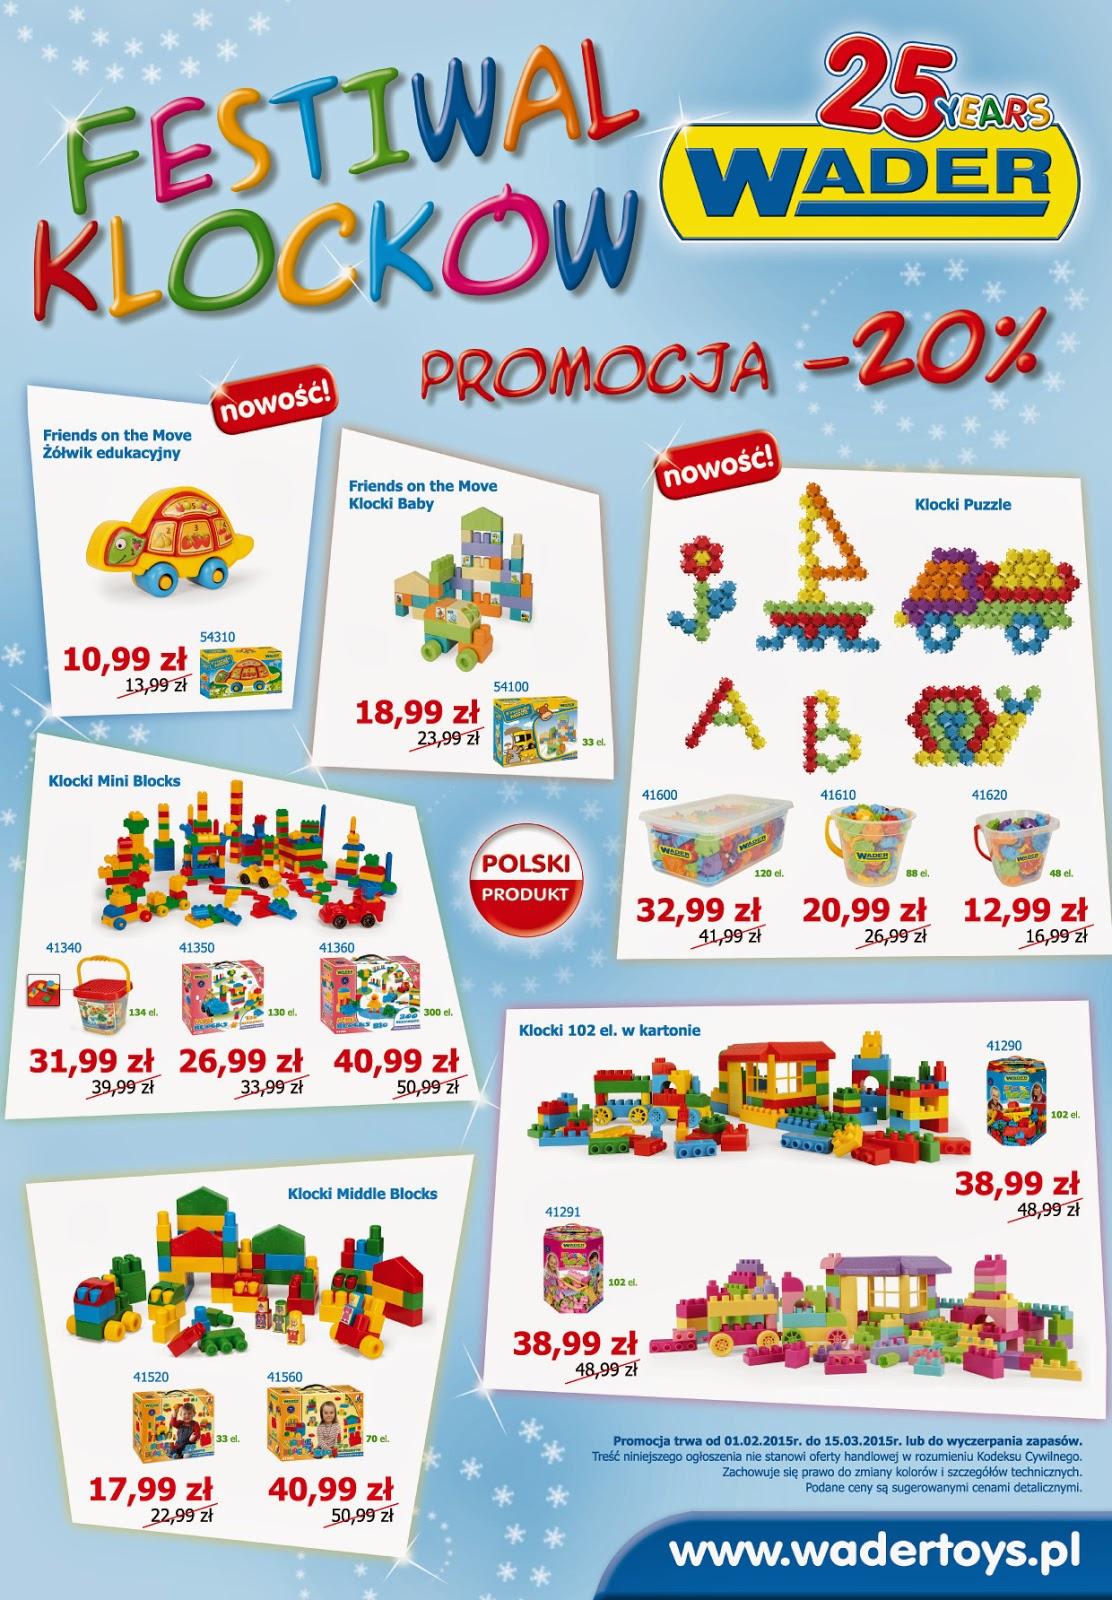 http://www.wader-zabawki.pl/category/festiwal-klockow